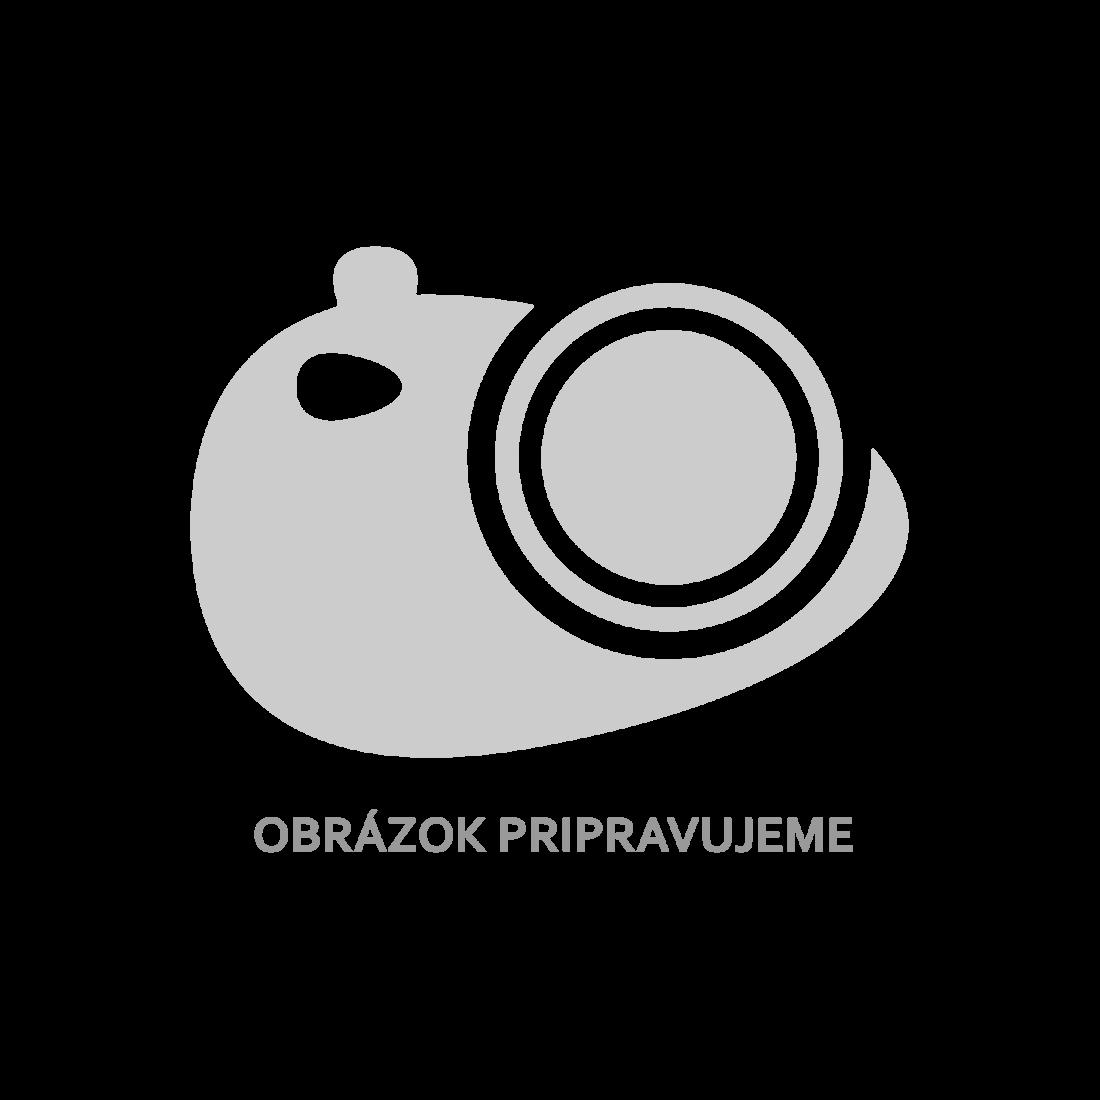 2ks barová stolička z ohýbaného dreva s nastaviteľnou opierkou chrbta